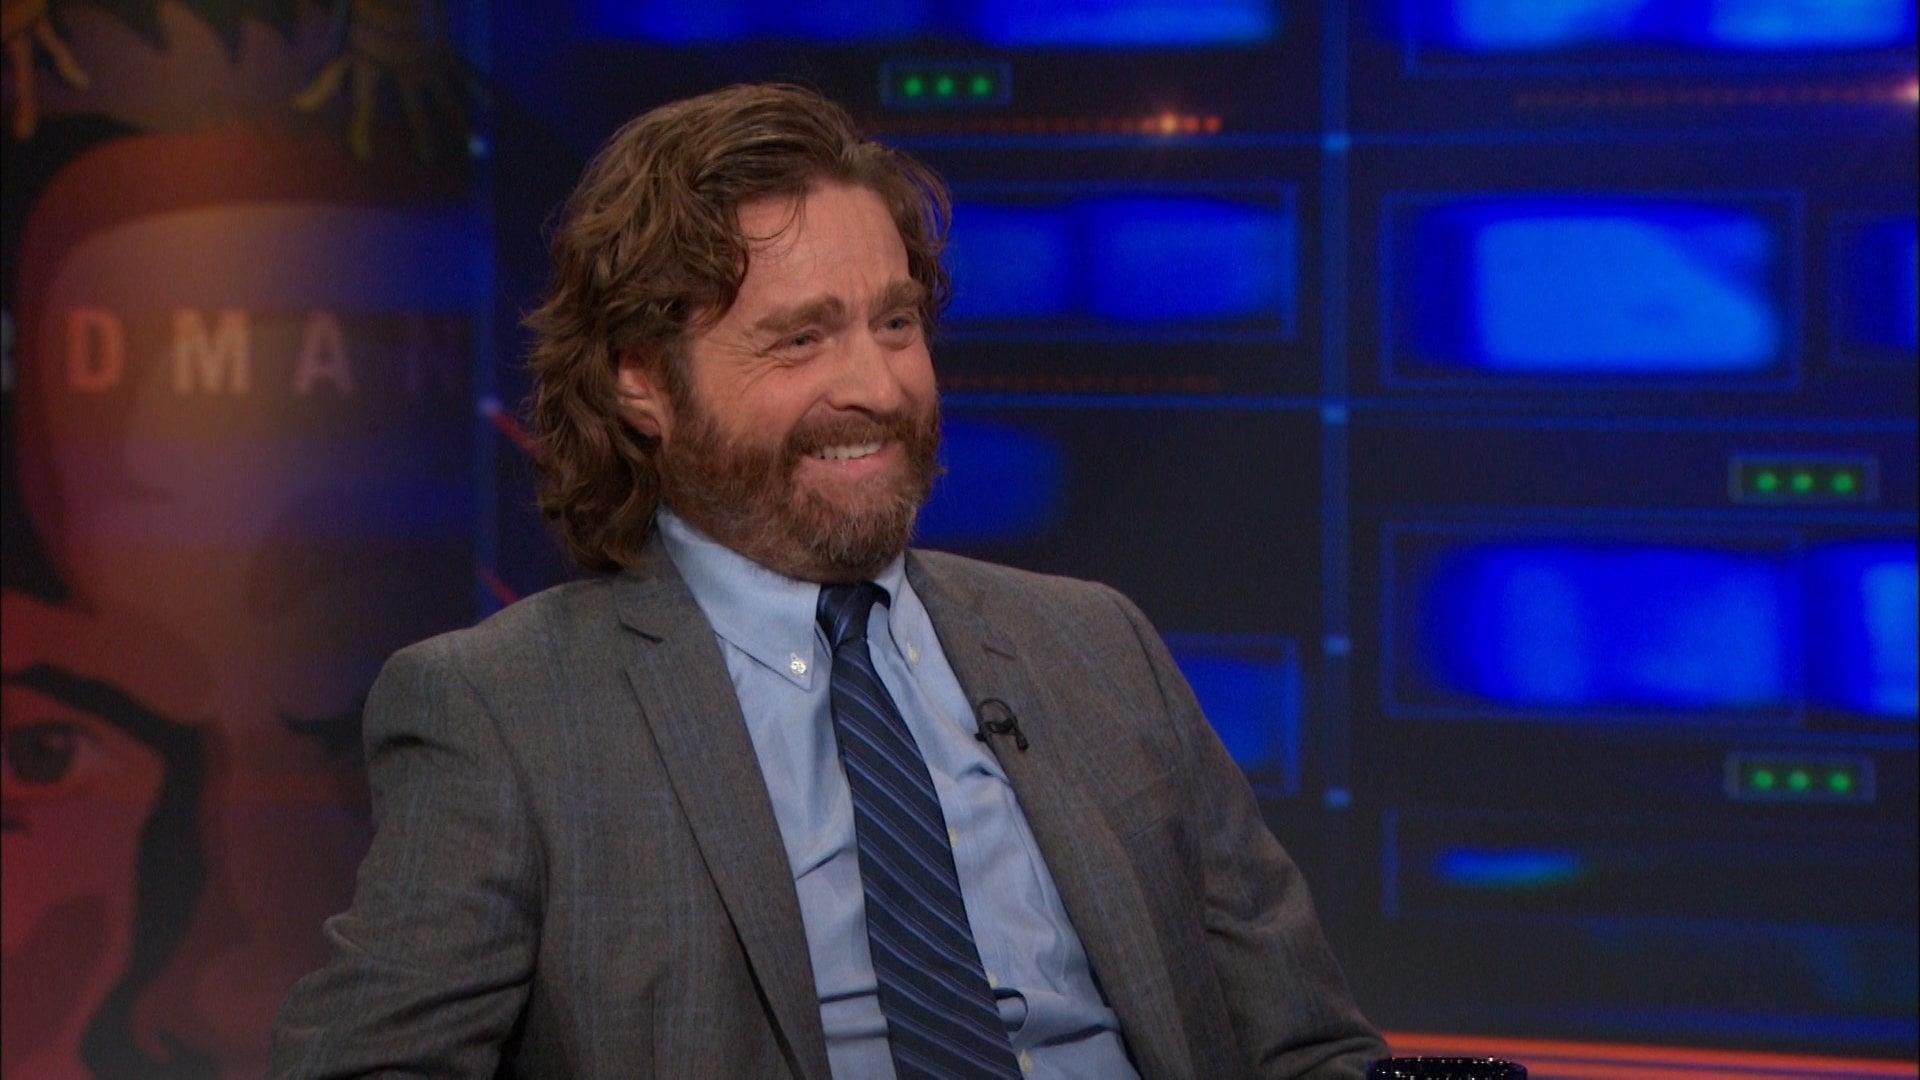 The Daily Show with Trevor Noah Season 20 :Episode 10  Zach Galifianakis